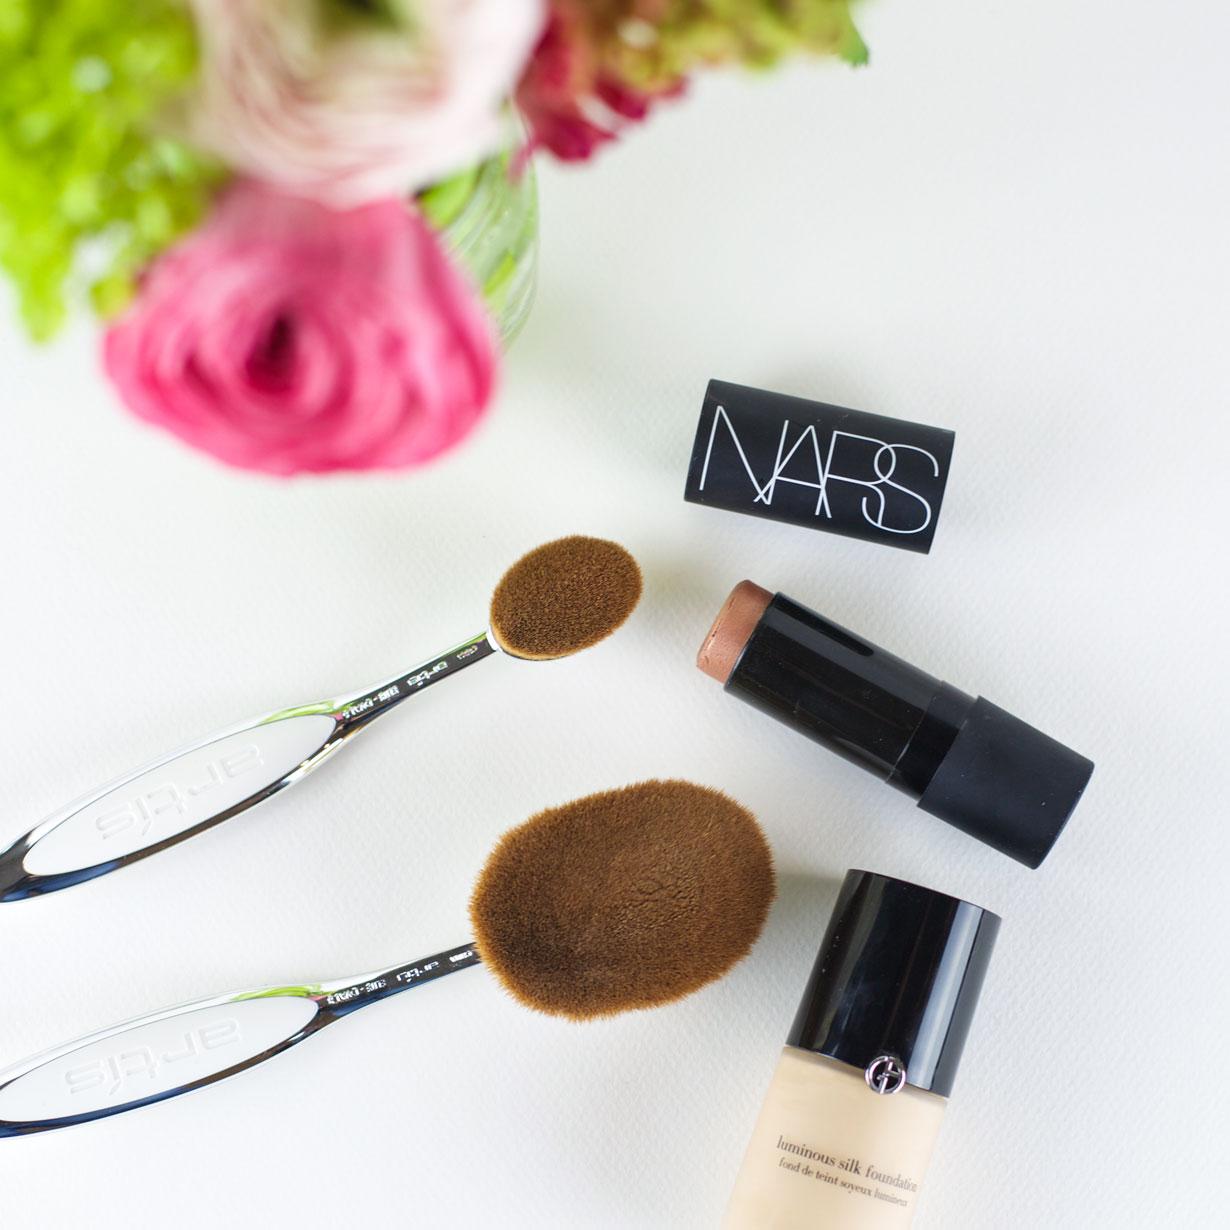 Artis Makeup Brushes Review Spring Beauty Bonjour Blue